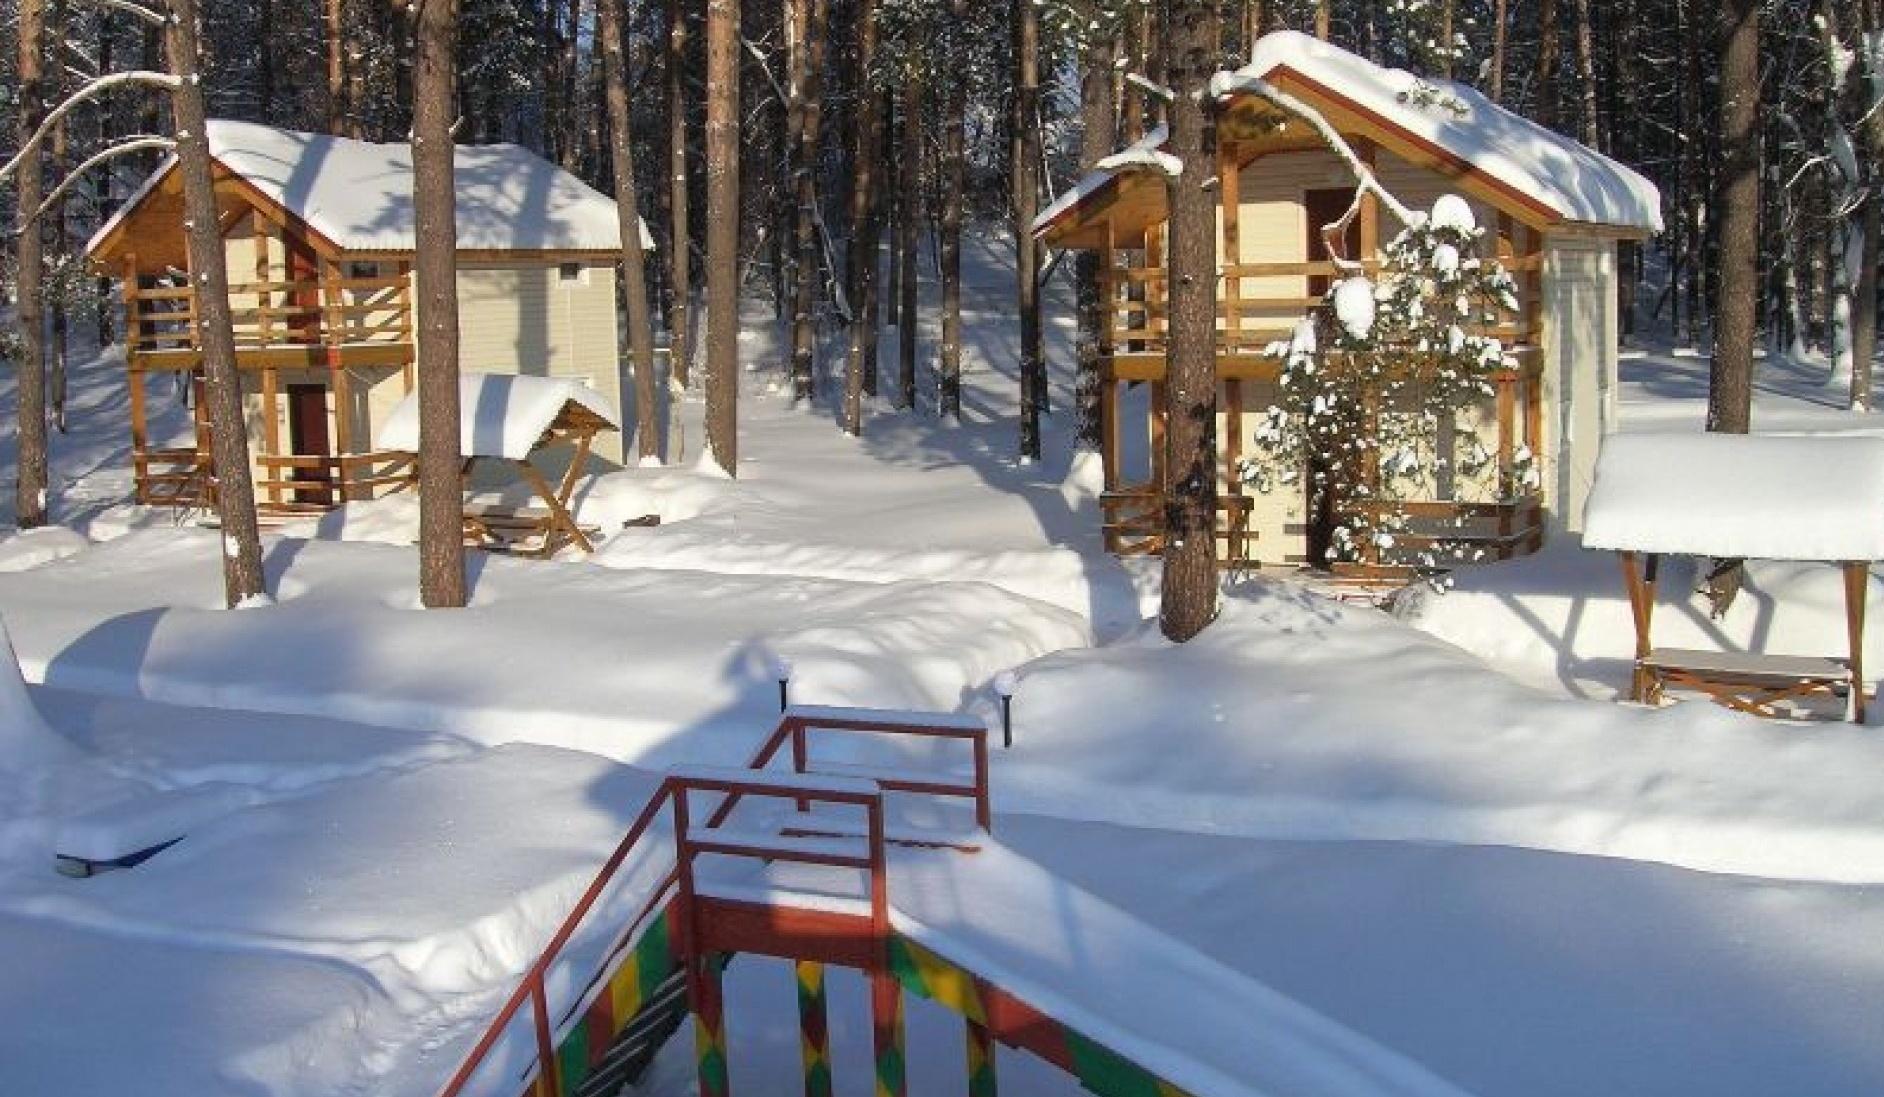 База отдыха «Лебяжье» Республика Татарстан, фото 15